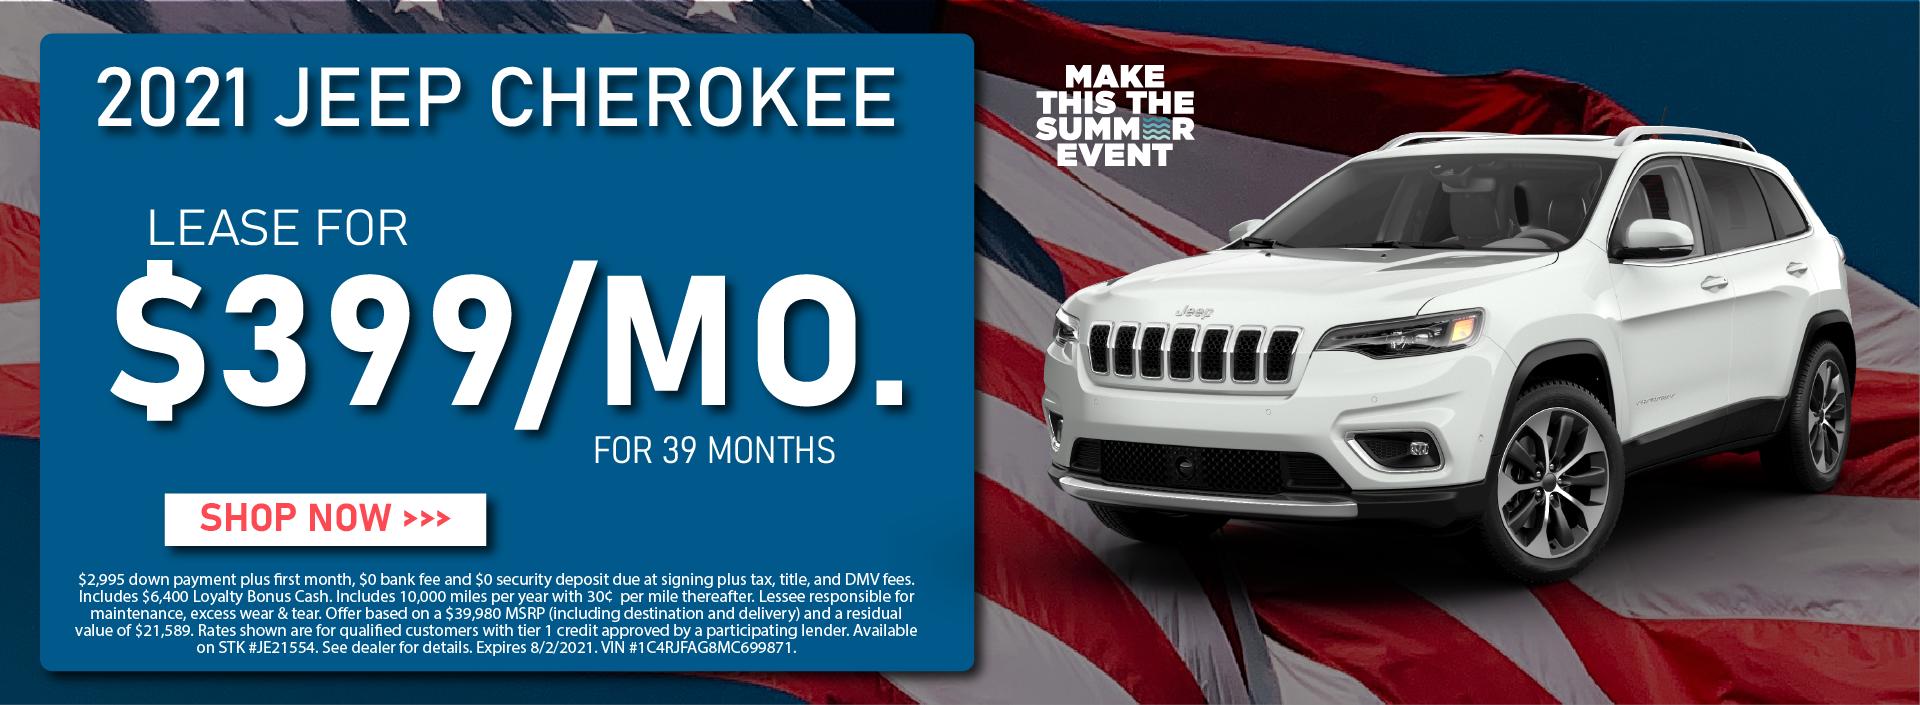 CDJR Manhattan – July 2021 – Jeep Cherokee